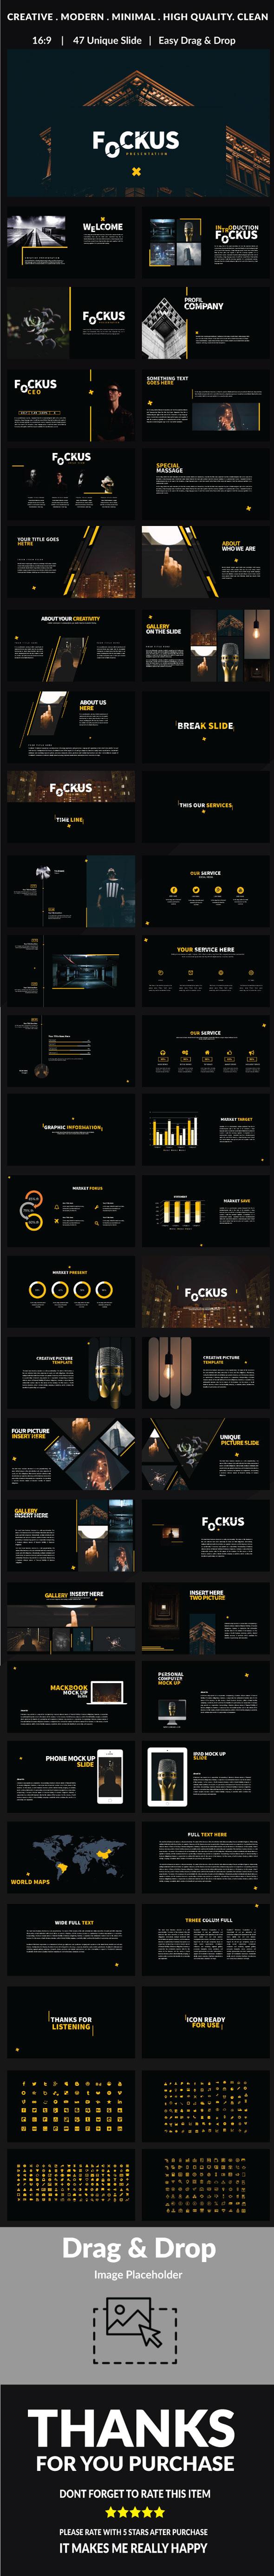 Fockus - Keynote Presentation - Keynote Templates Presentation Templates